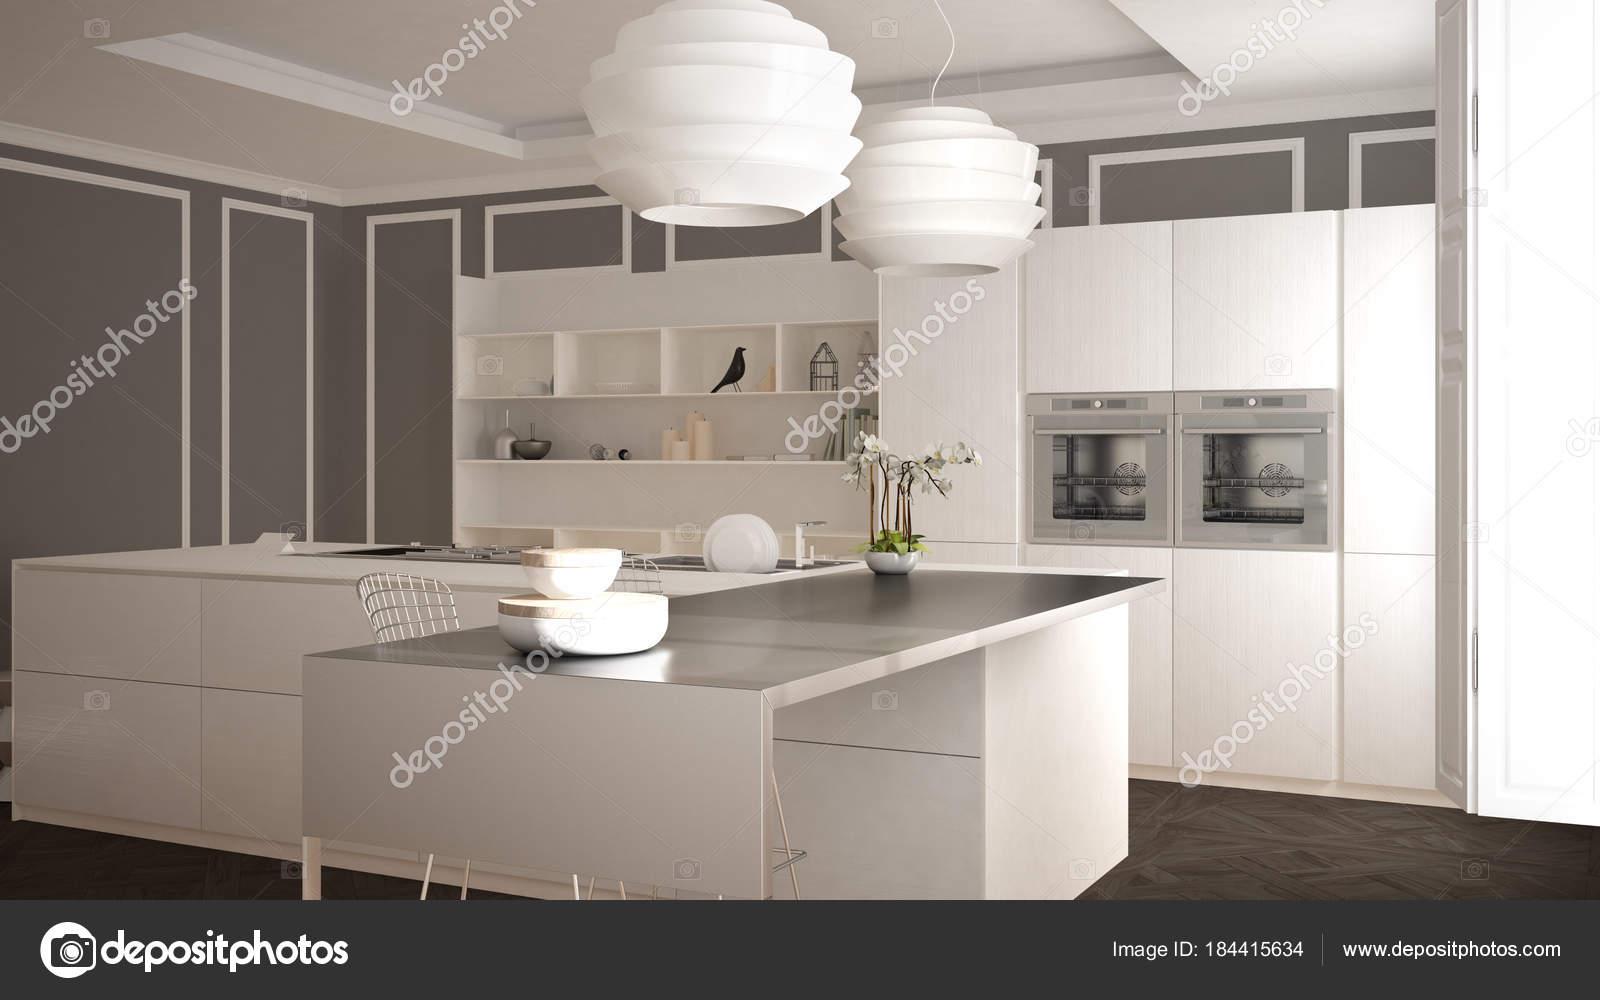 modern kitchen stools chandeliers home depot 现代厨房在古典内饰 海岛与凳子和二个大窗口 白色和灰色建筑学室内设计